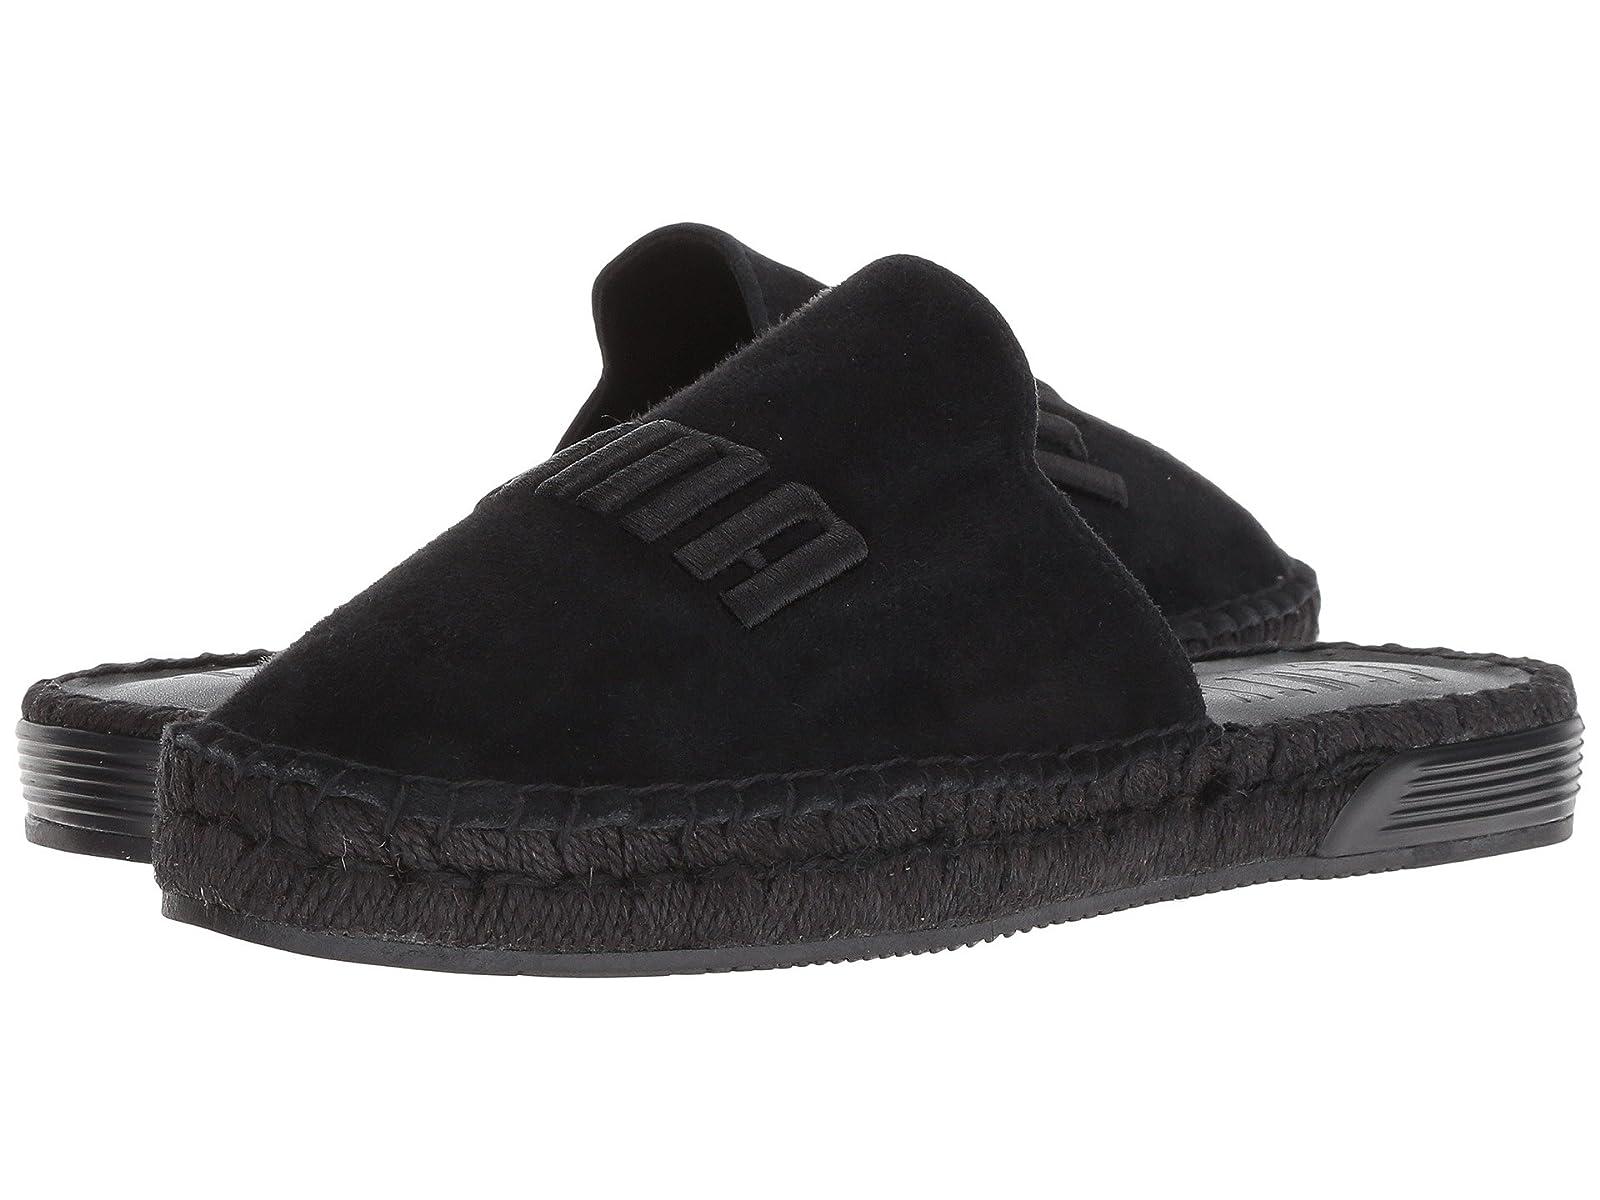 PUMA PUMA x Fenty by Rihanna EspadrilleAtmospheric grades have affordable shoes